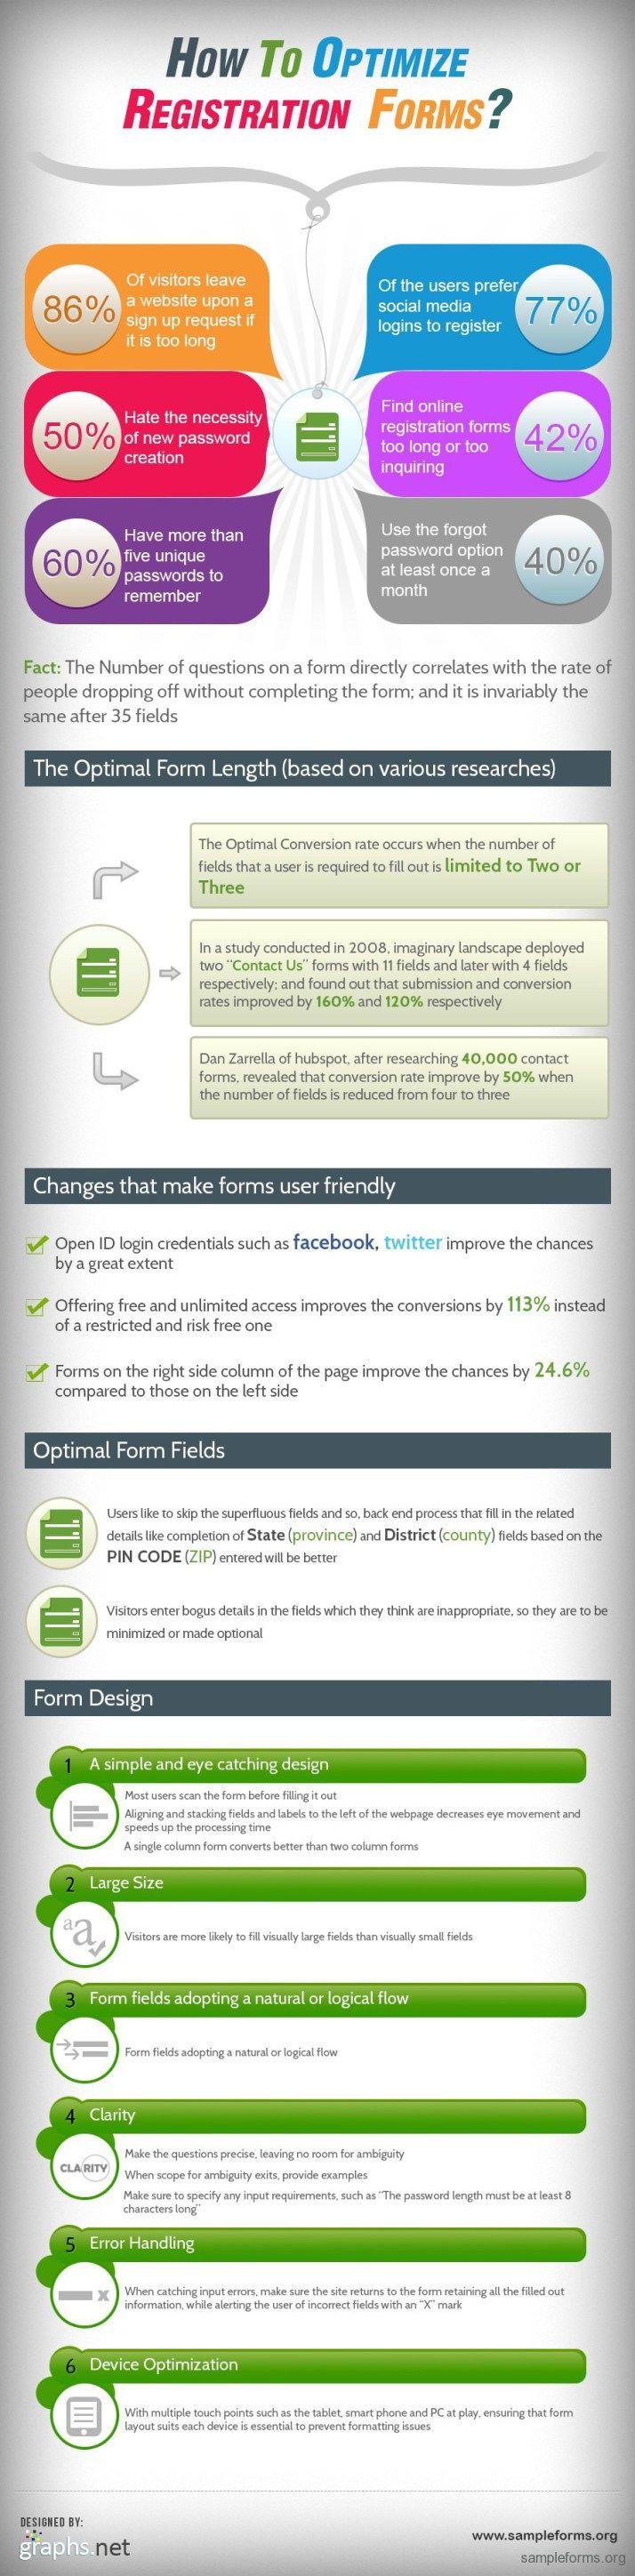 How to optimize registration forms #infografia #infographic #marketing